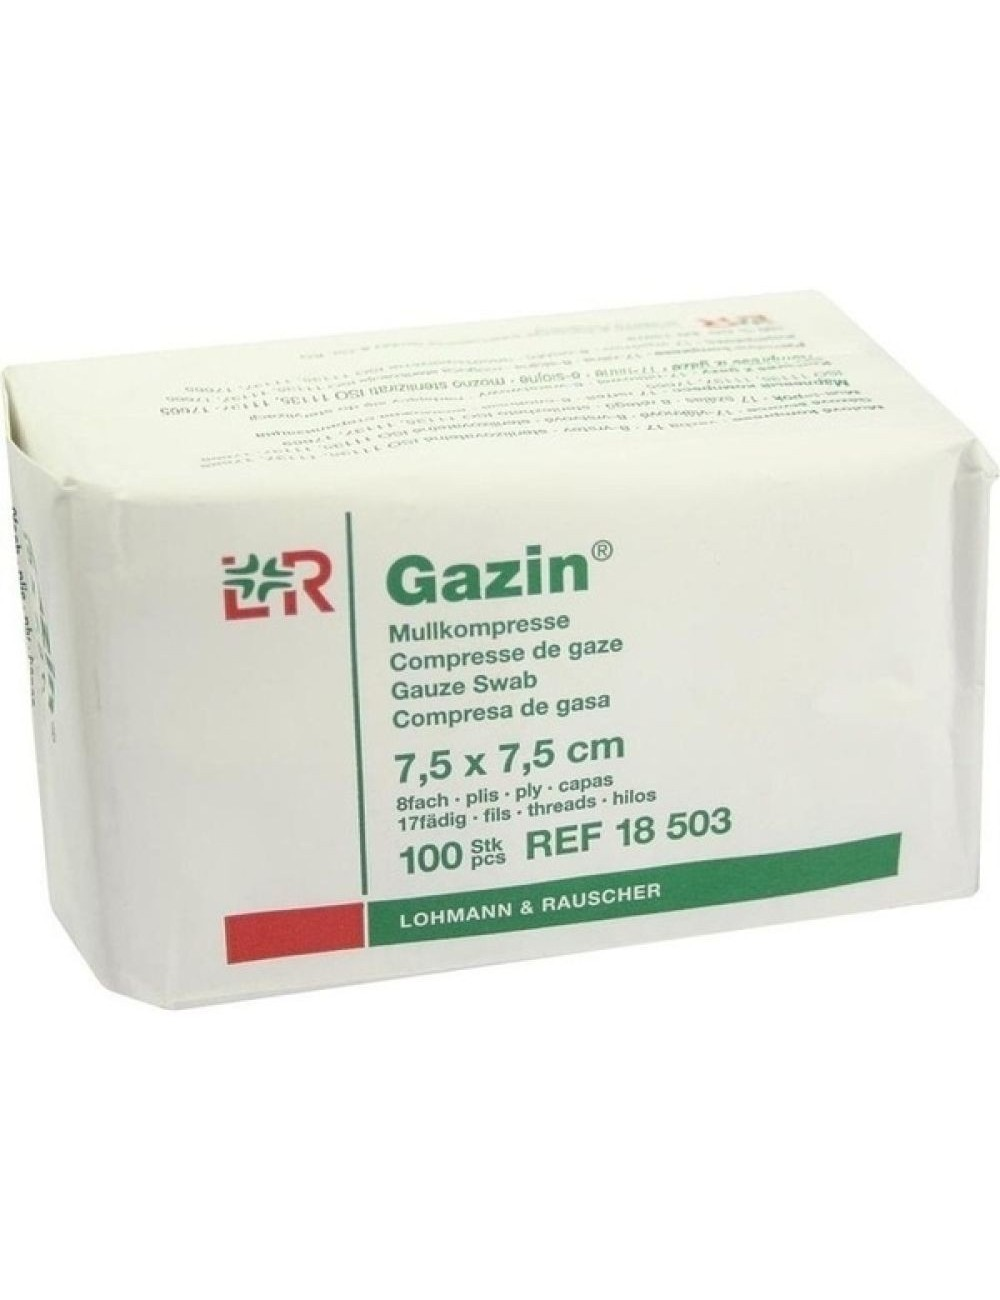 OP-Mullkompressen Gazin® 8-fach gelegt